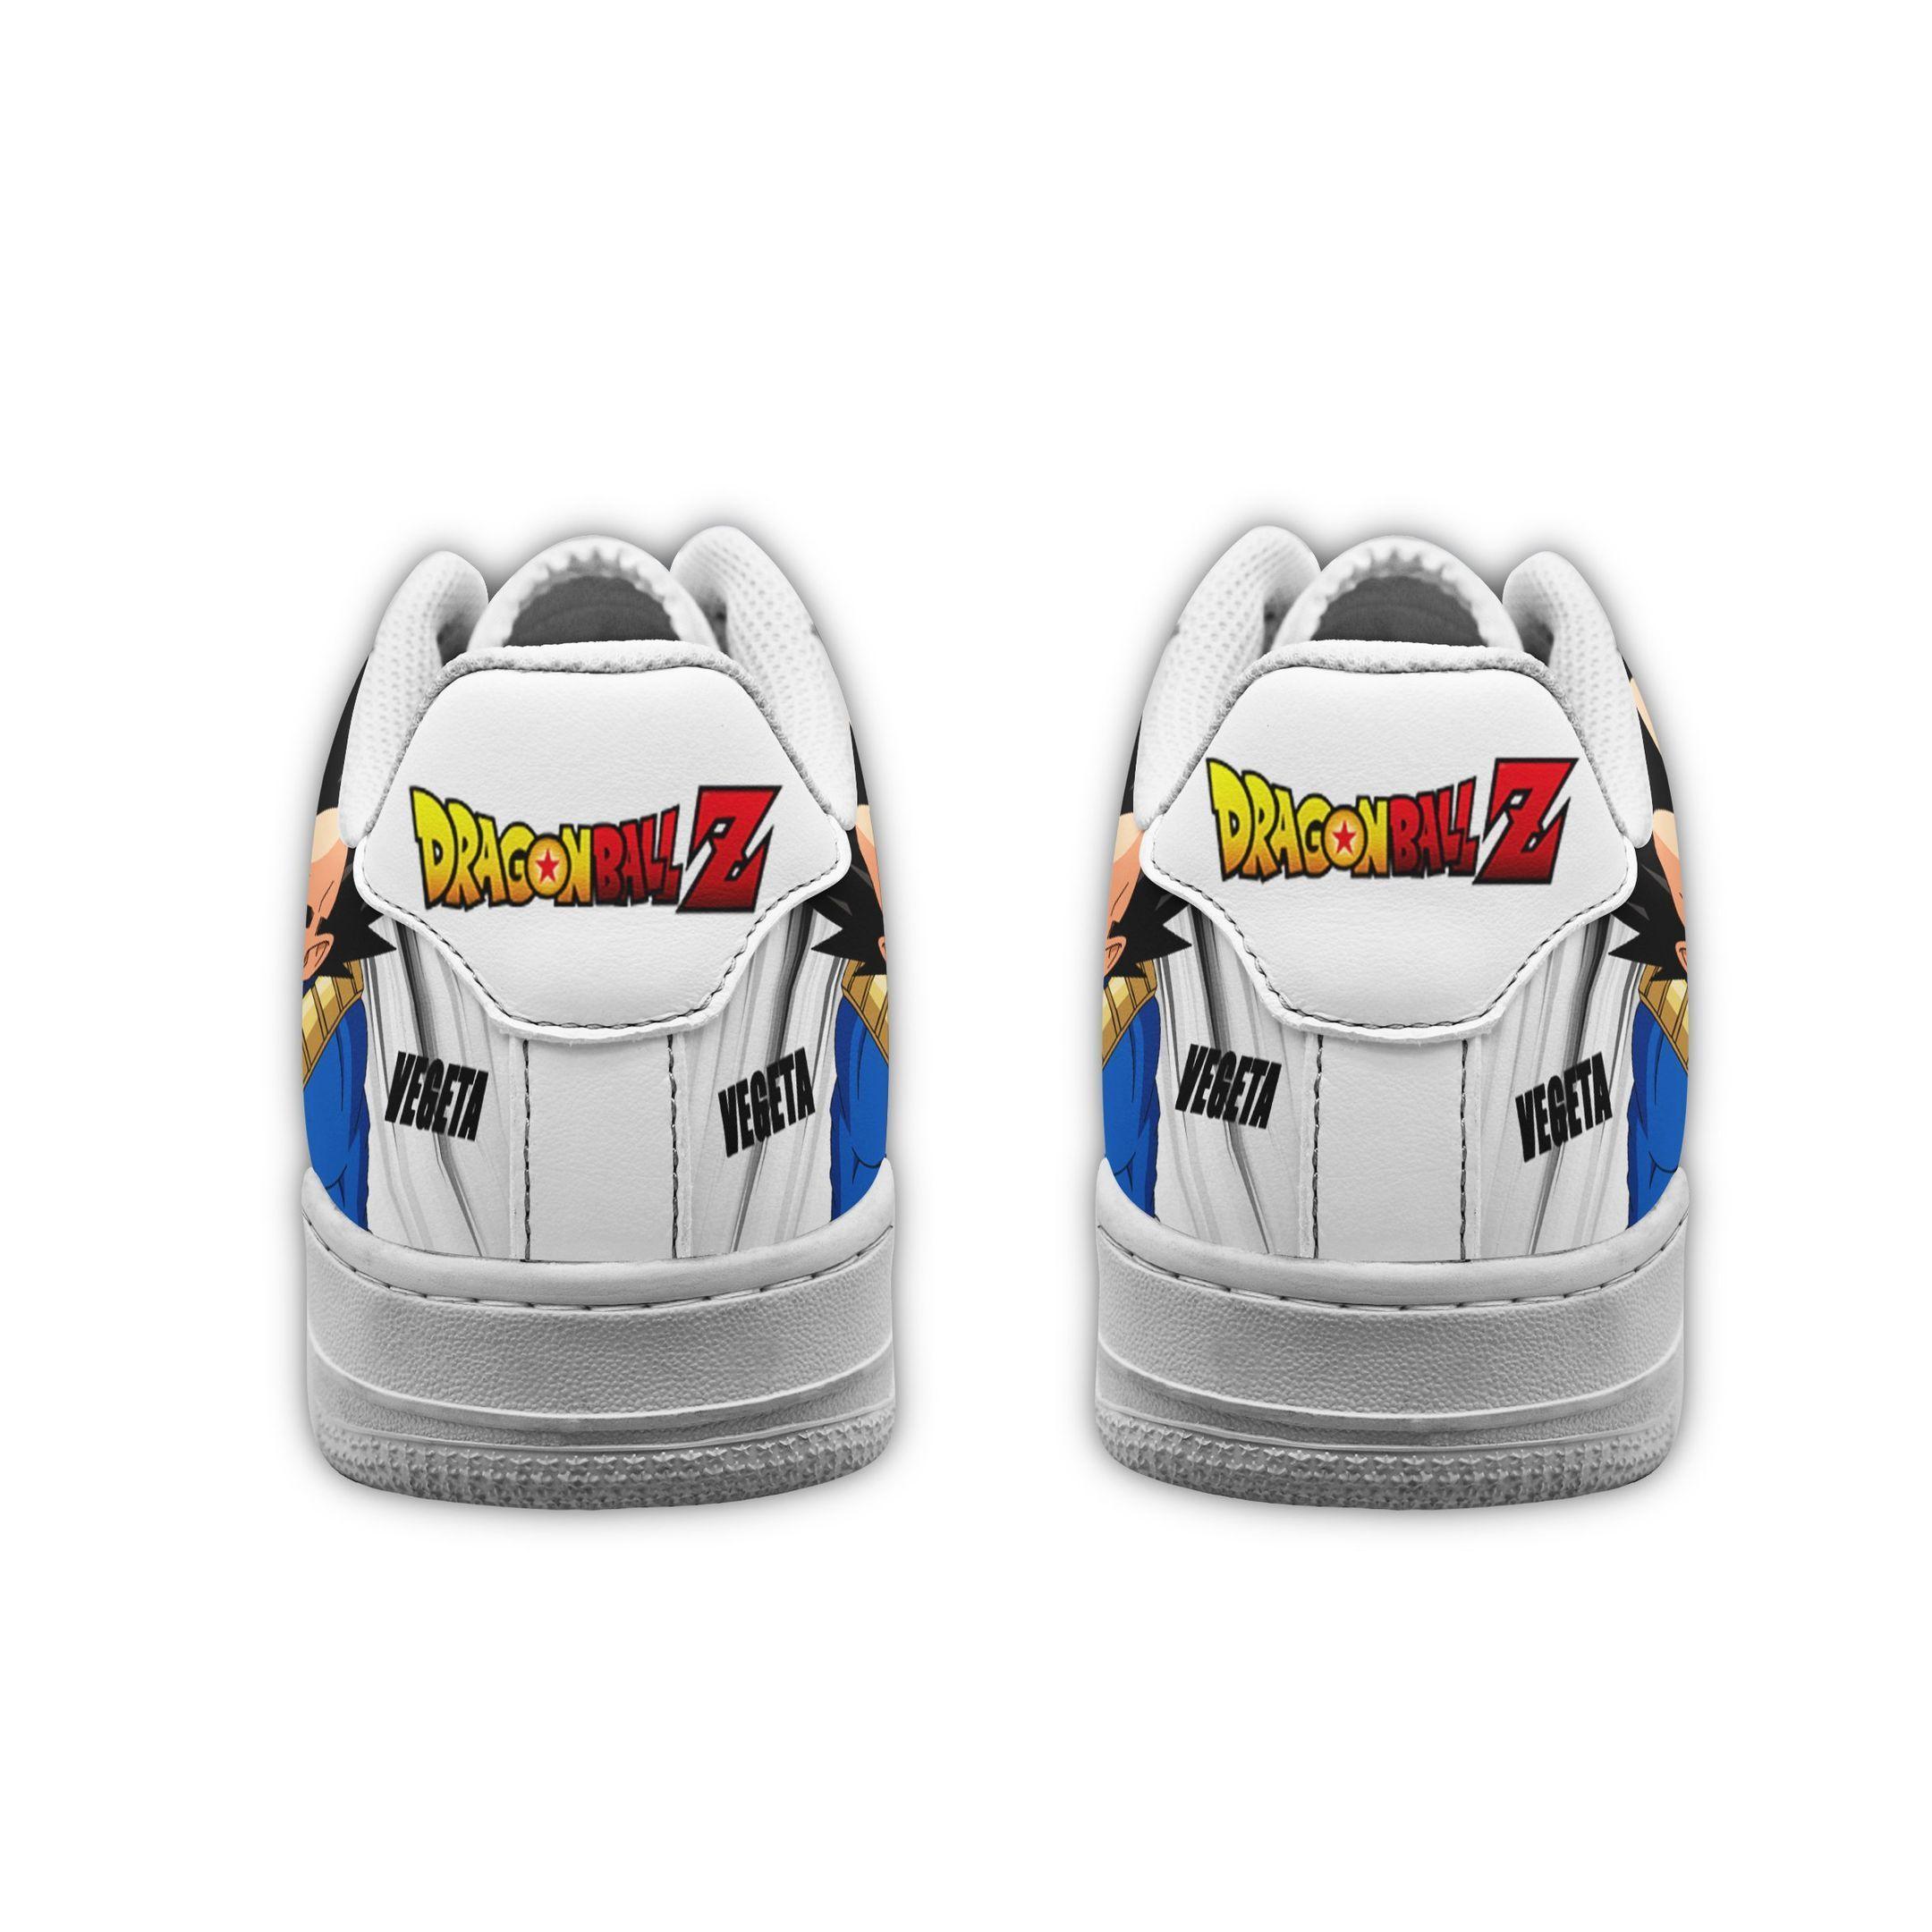 Vegeta Air Shoes Custom Dragon Ball Z Anime Shoes GO1012